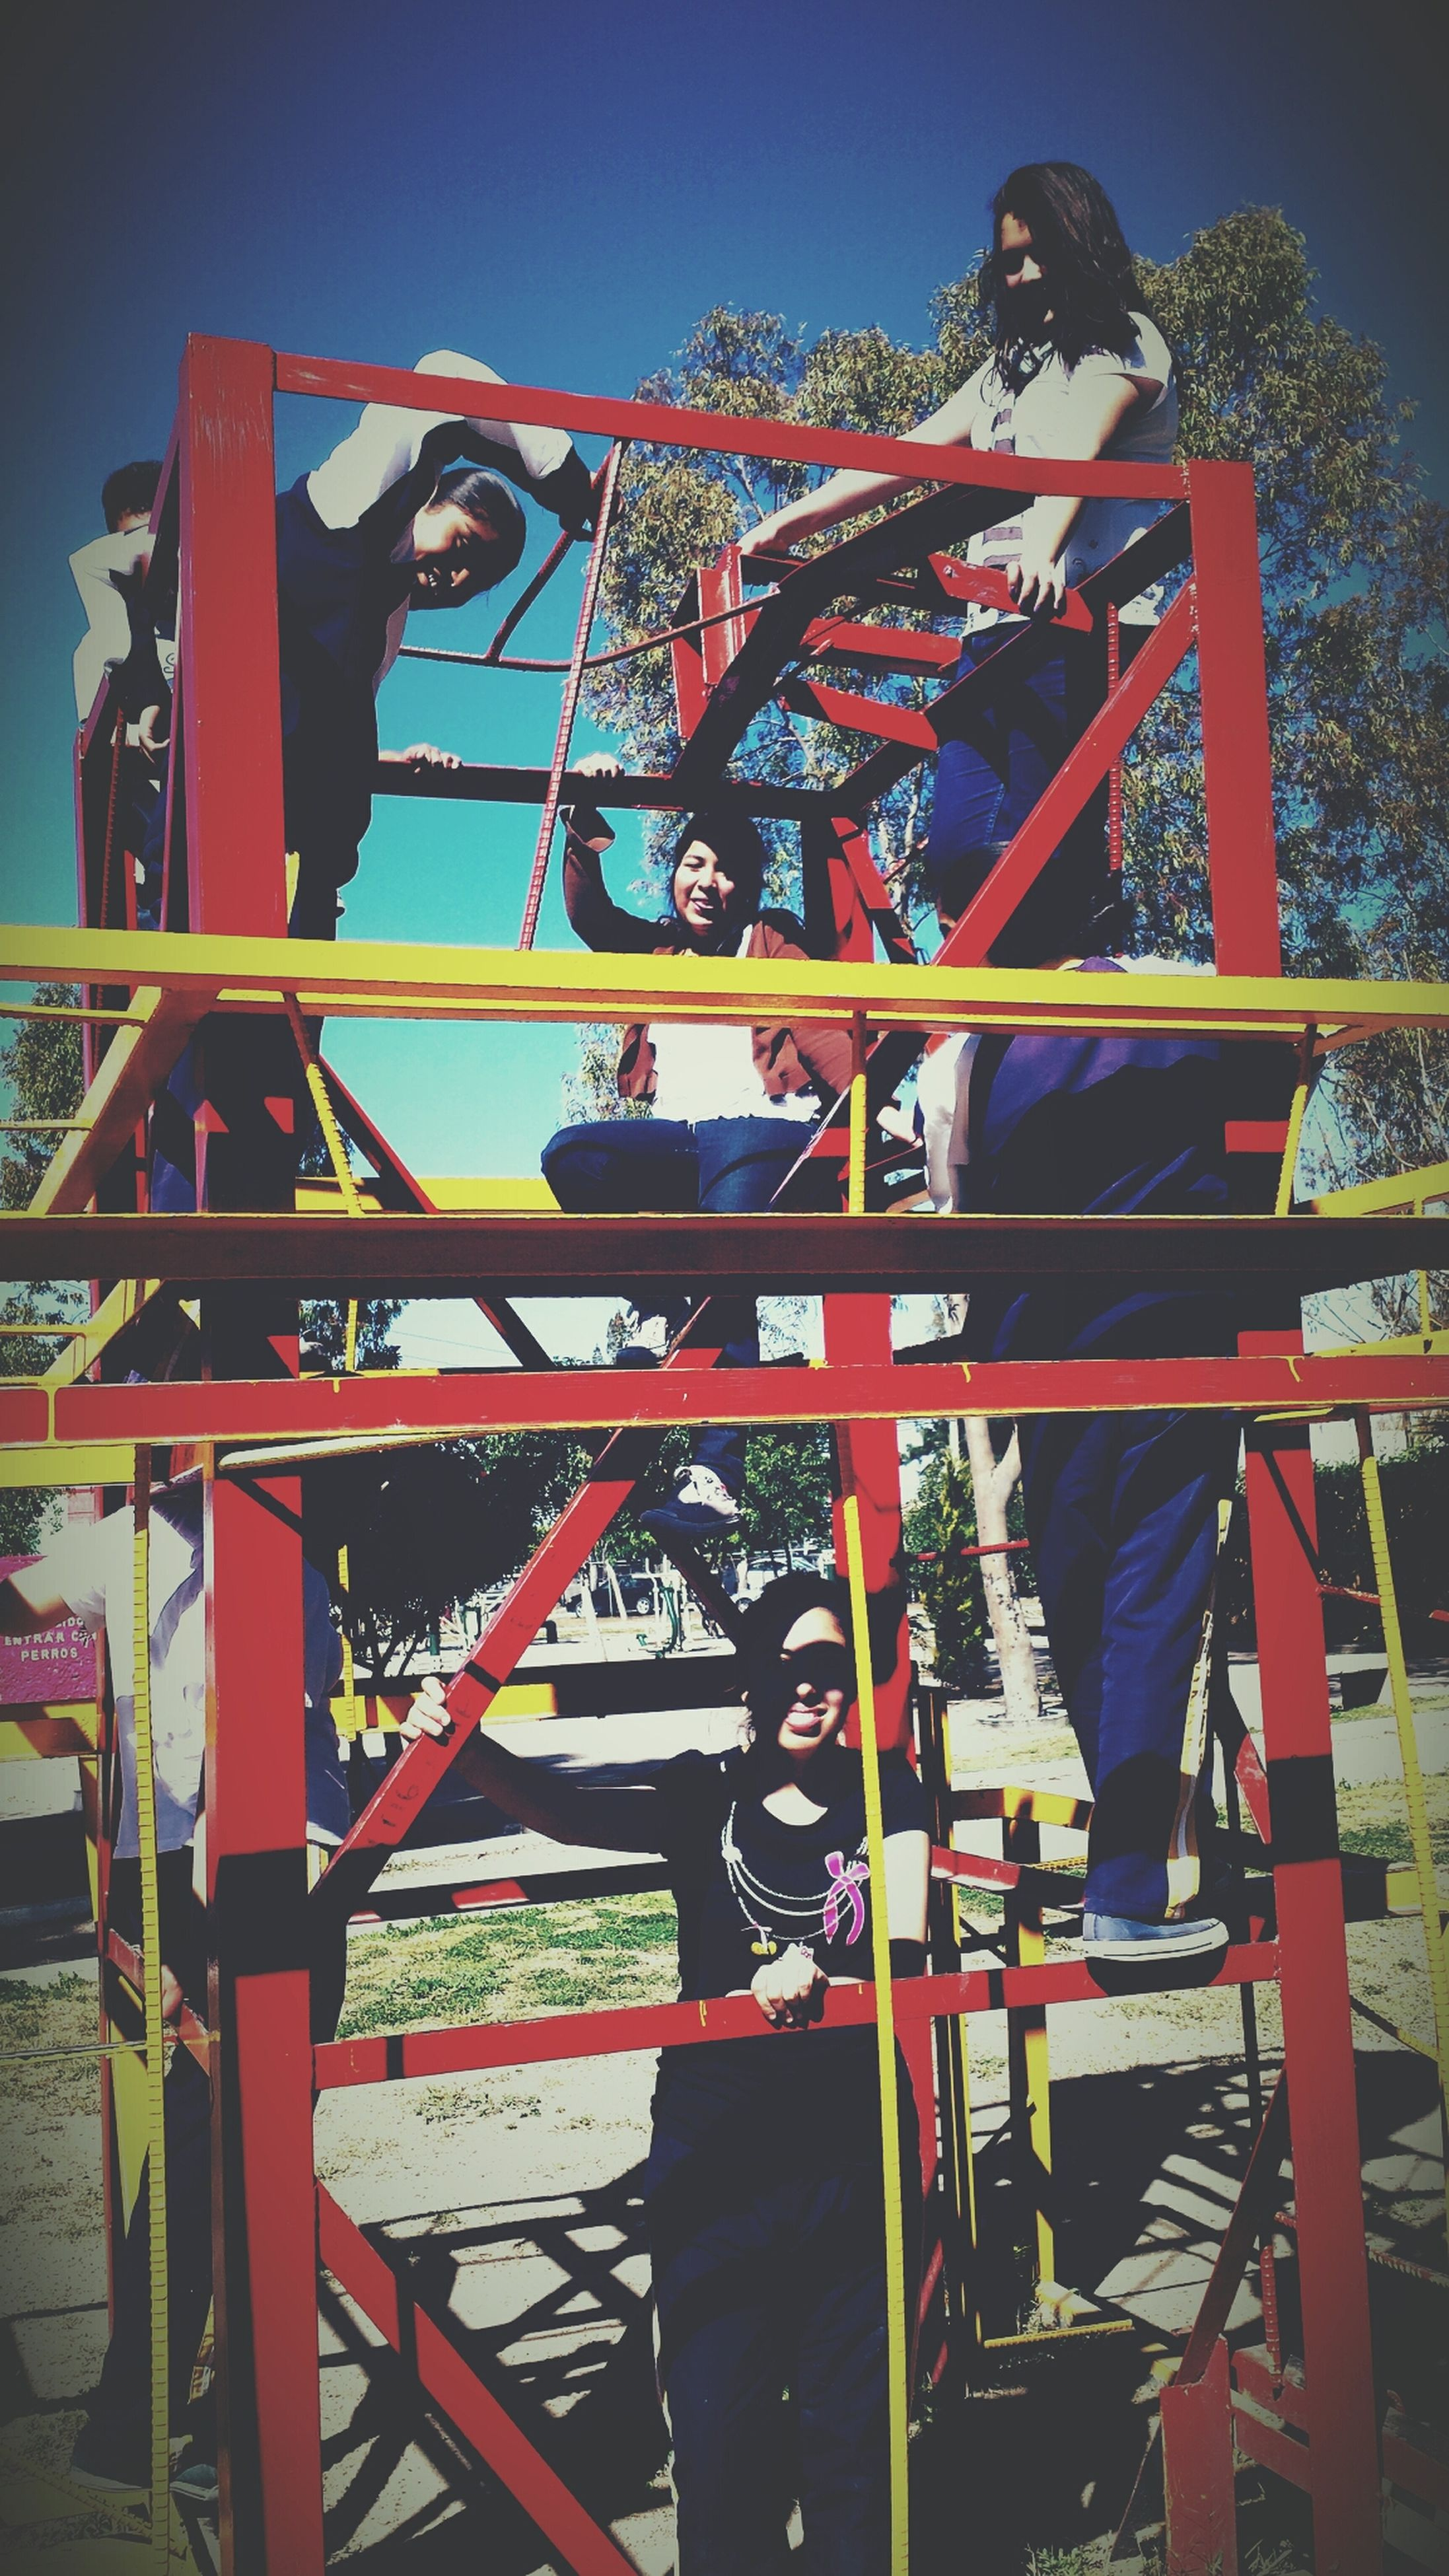 leisure activity, lifestyles, low angle view, red, amusement park, metal, standing, childhood, arts culture and entertainment, casual clothing, sky, built structure, men, amusement park ride, boys, fun, enjoyment, protection